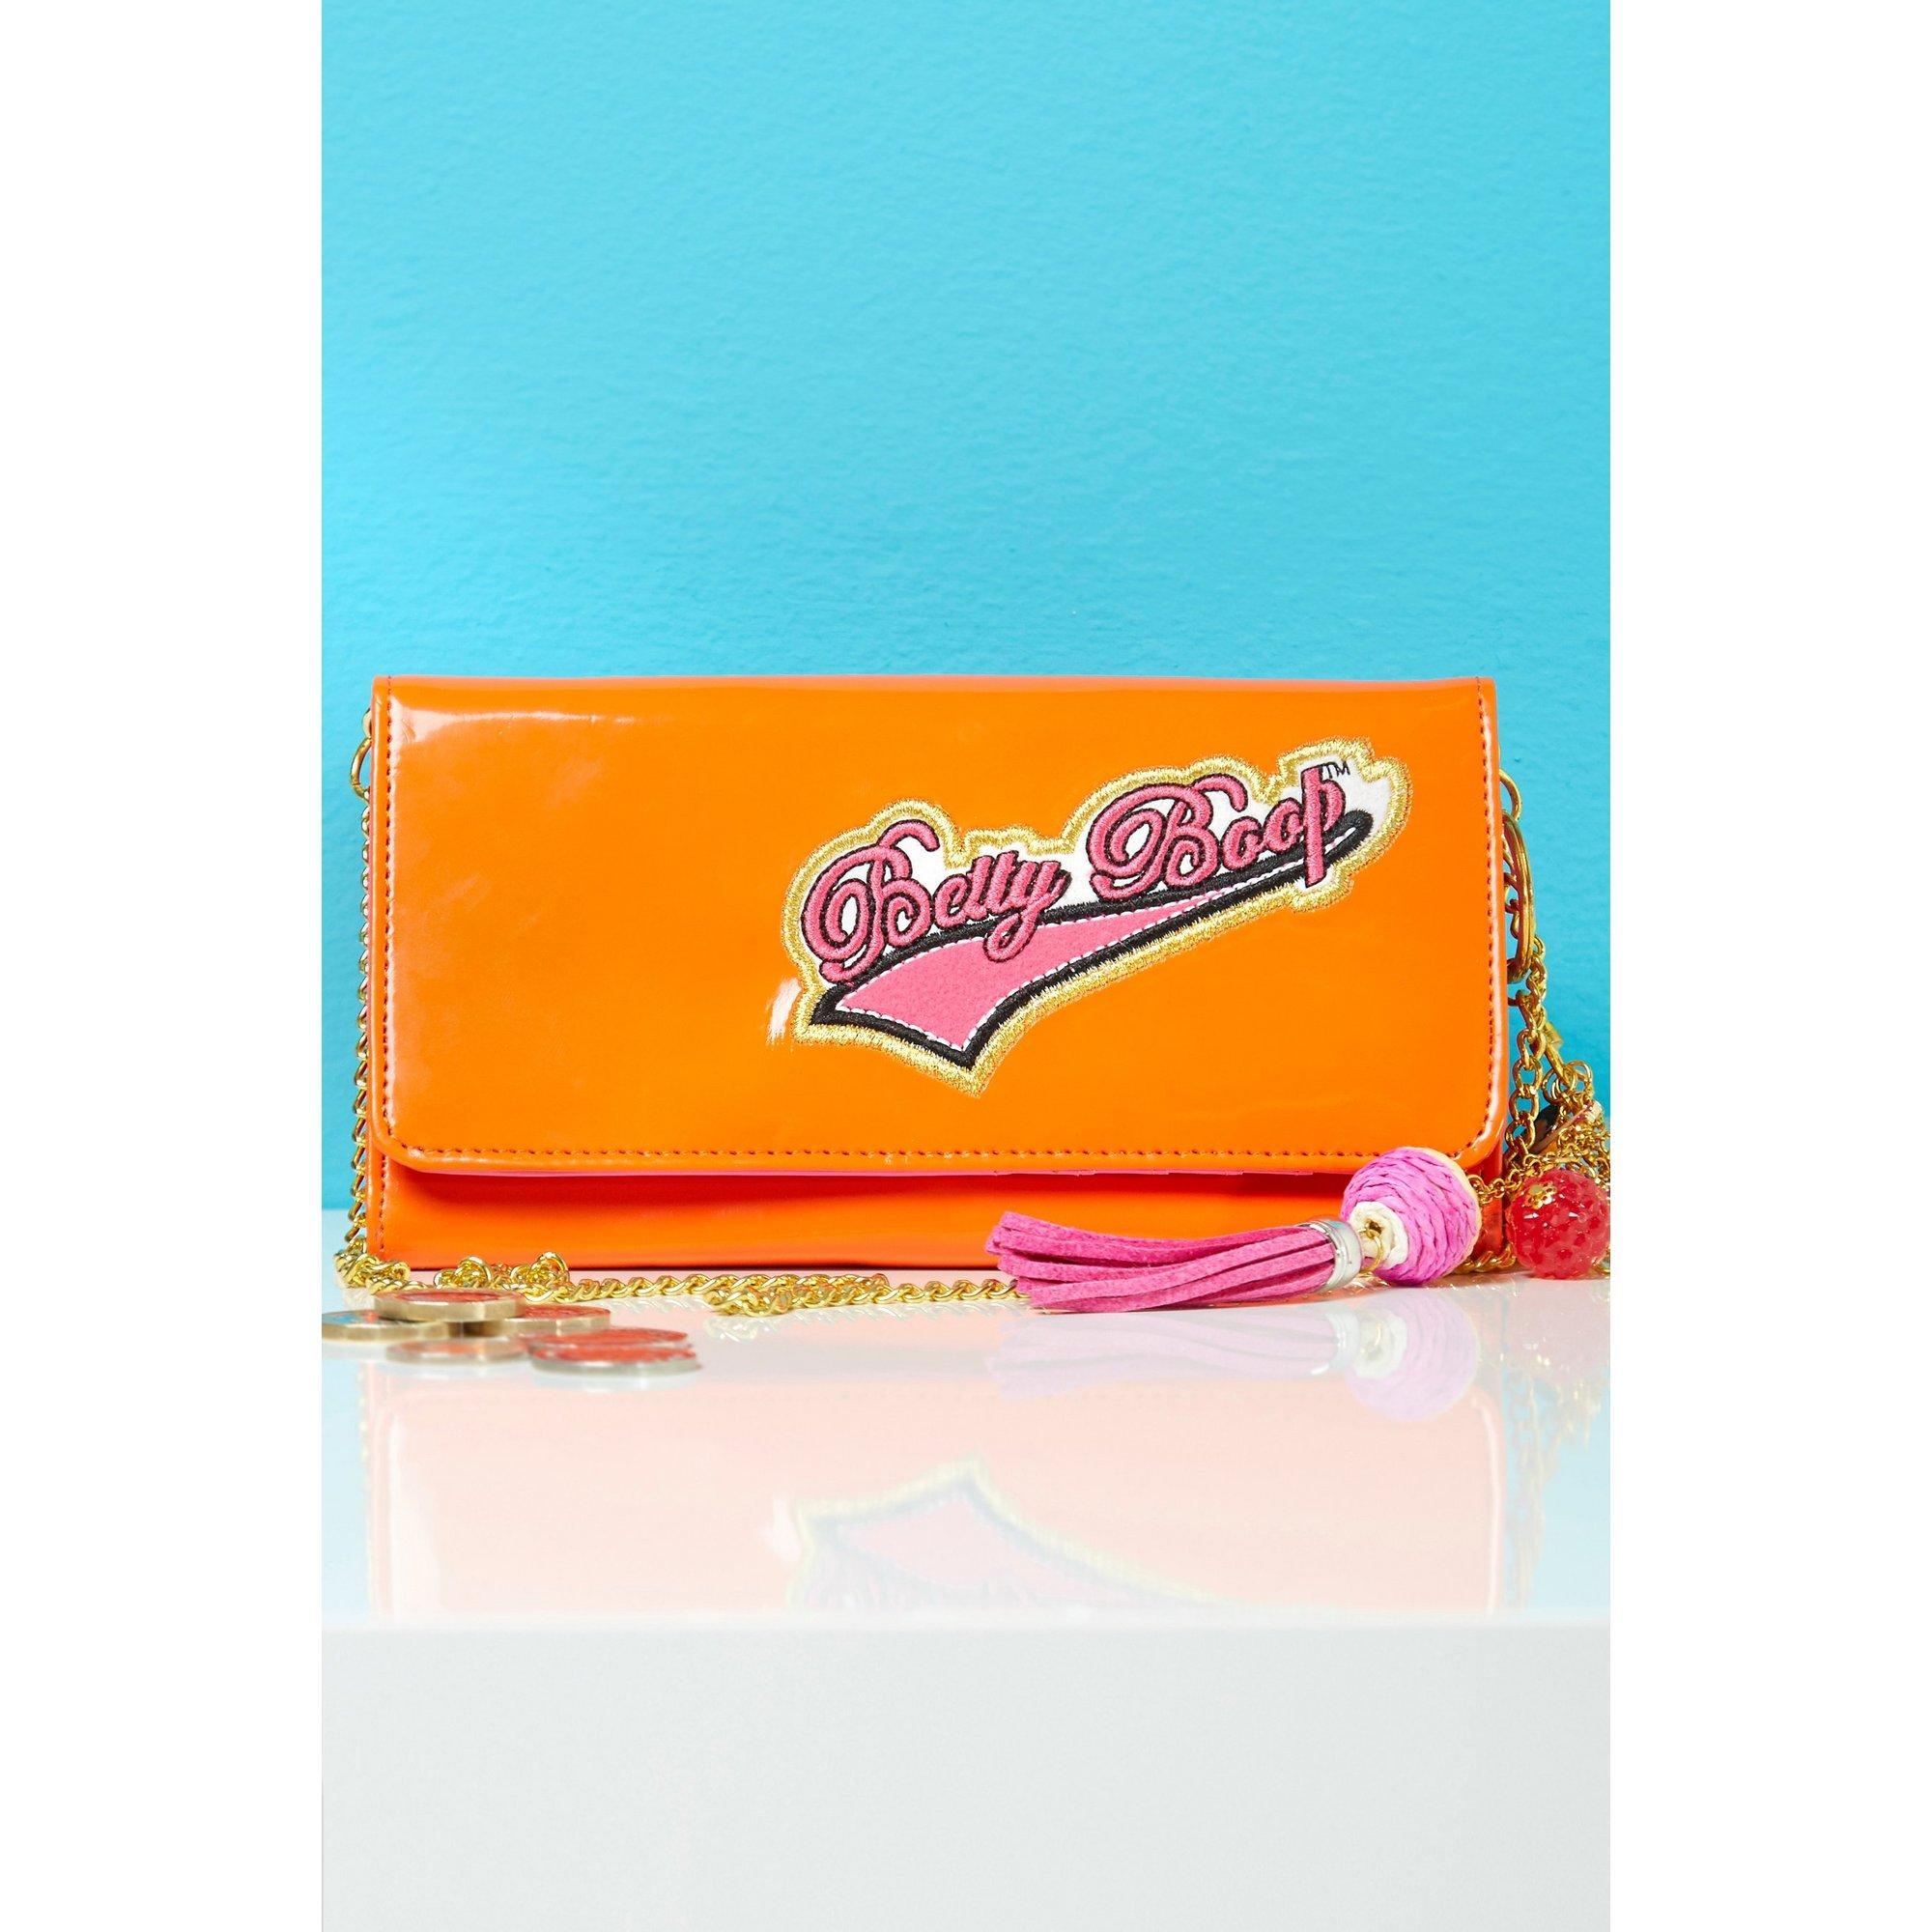 Image of Betty Boop Clutch Me Clutch Bag